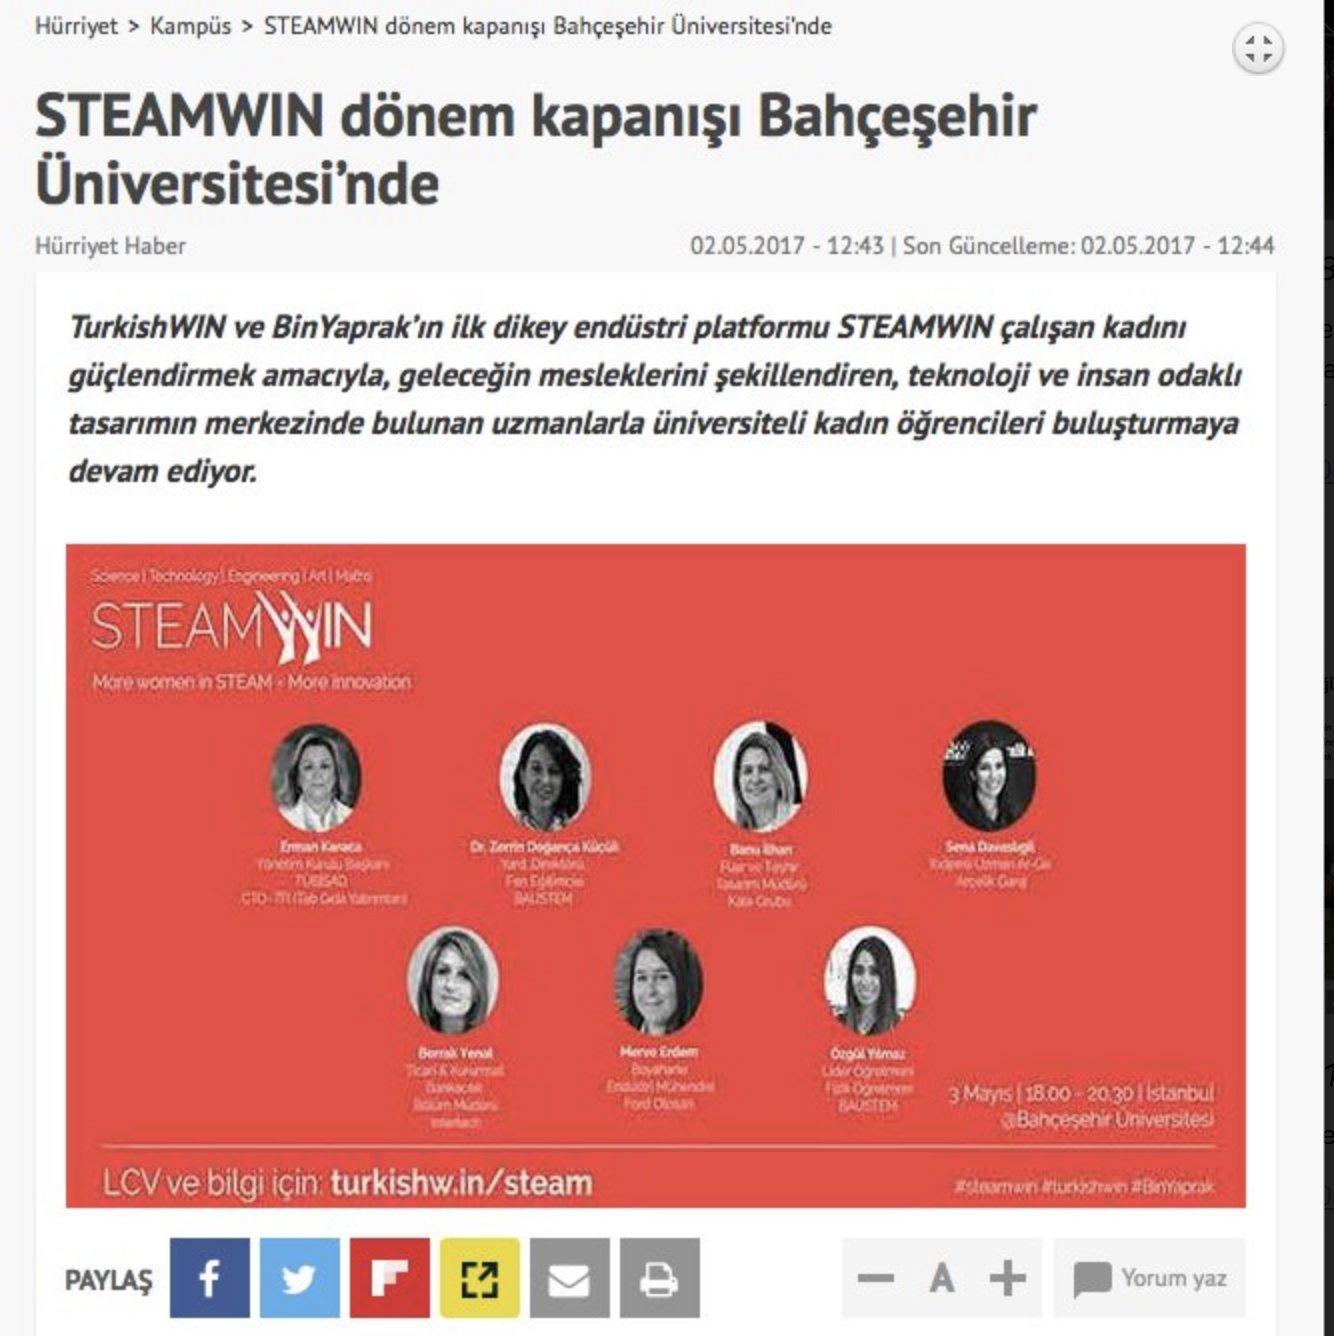 TurkishWIN ve BinYaprak'ın ilk dikey endüstri platformu olan STEAMWIN